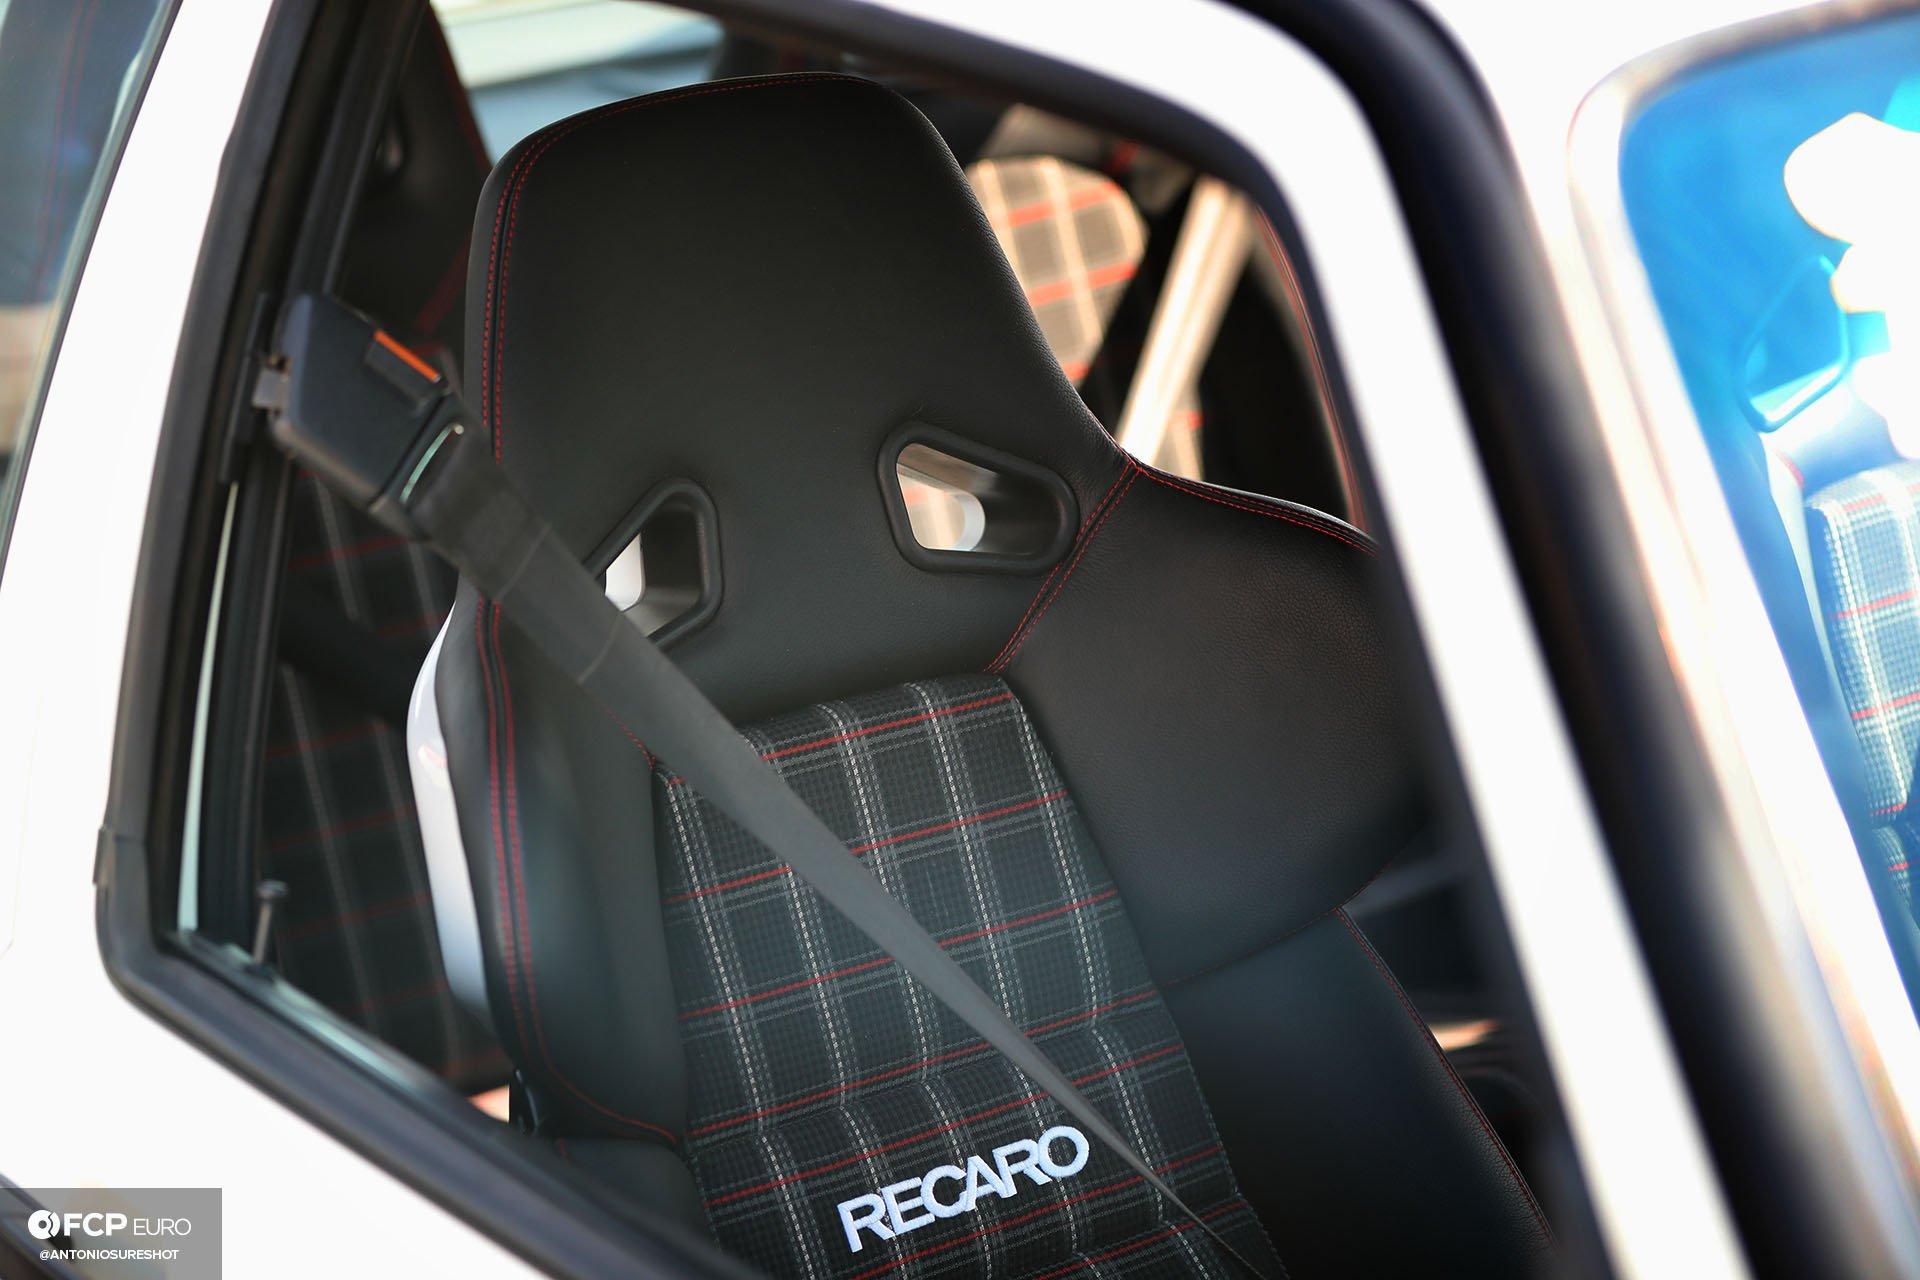 VW GTI Recaro reclining seats